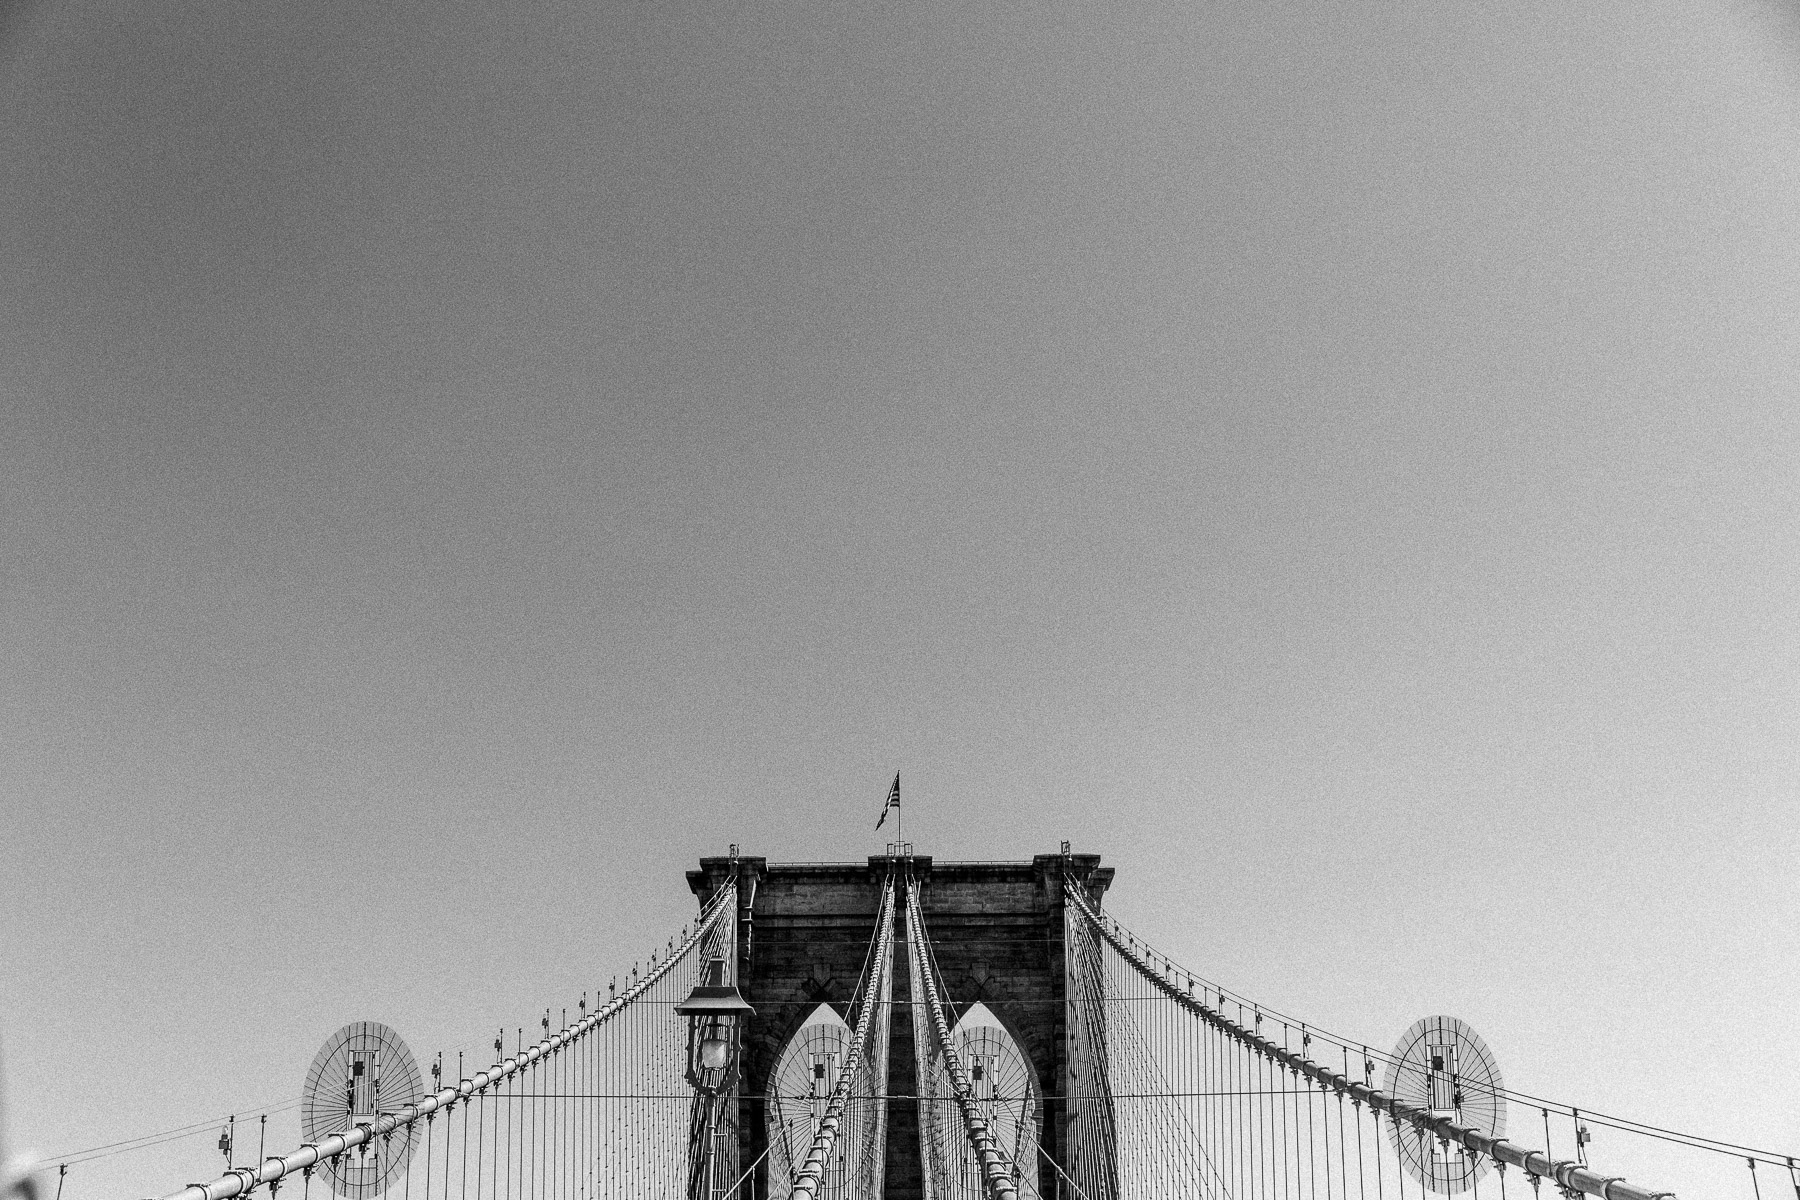 brooklyn-bridge-photo-inspiration-bw.jpg